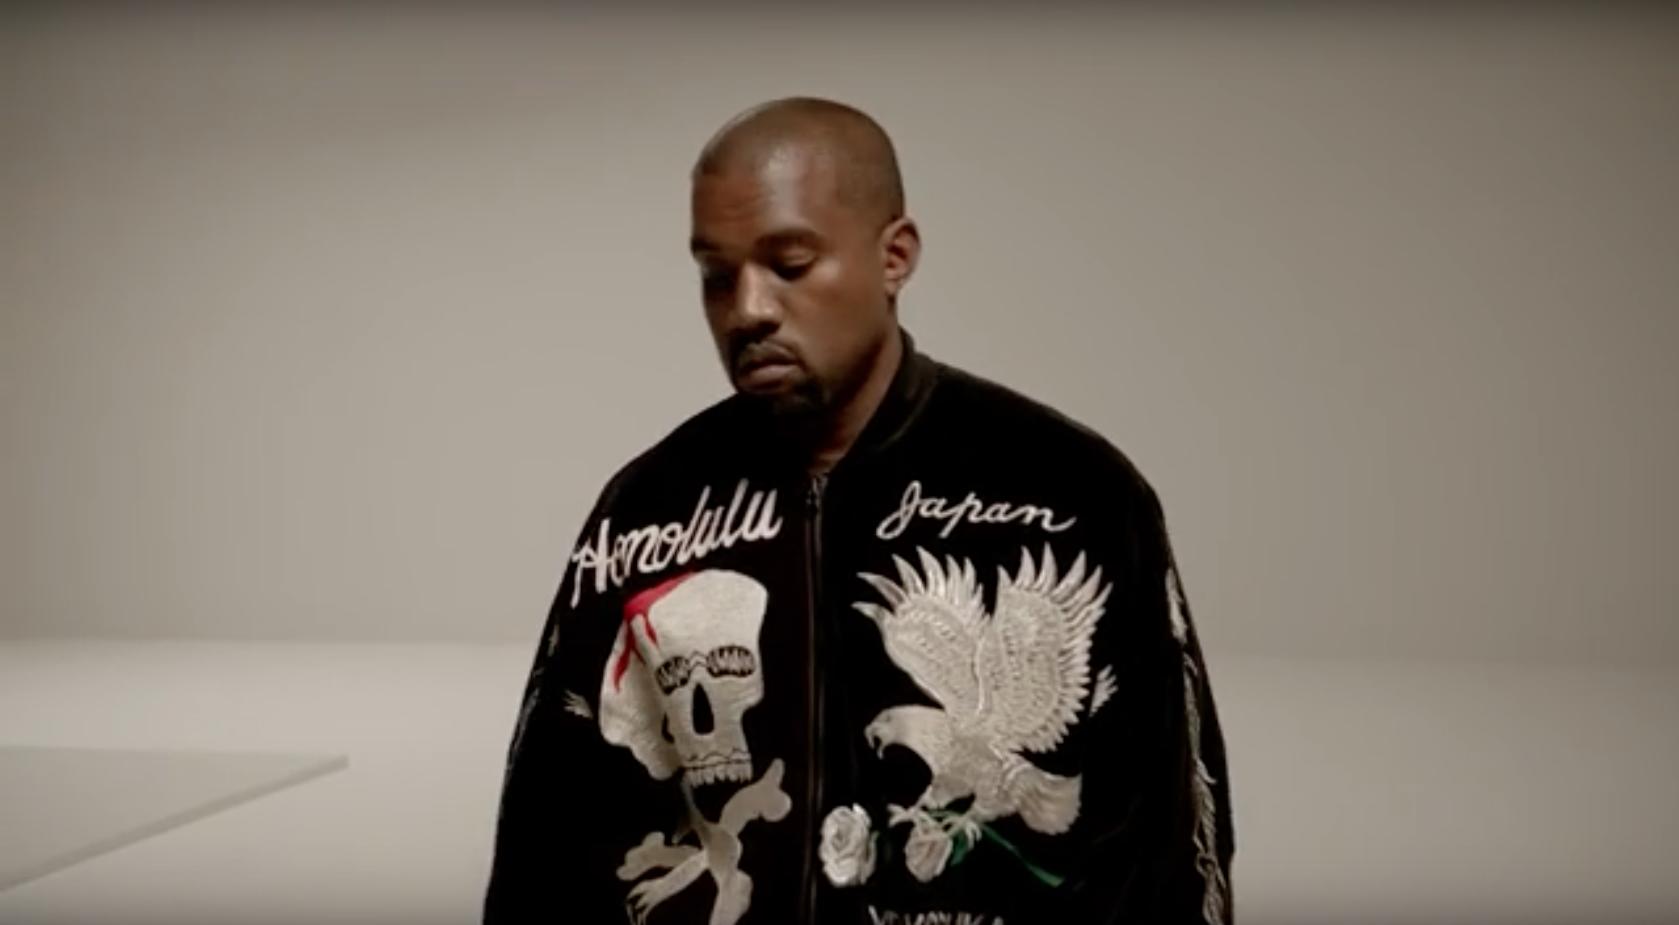 Francis and the Lights & Kanye West (ft. Bon Iver)